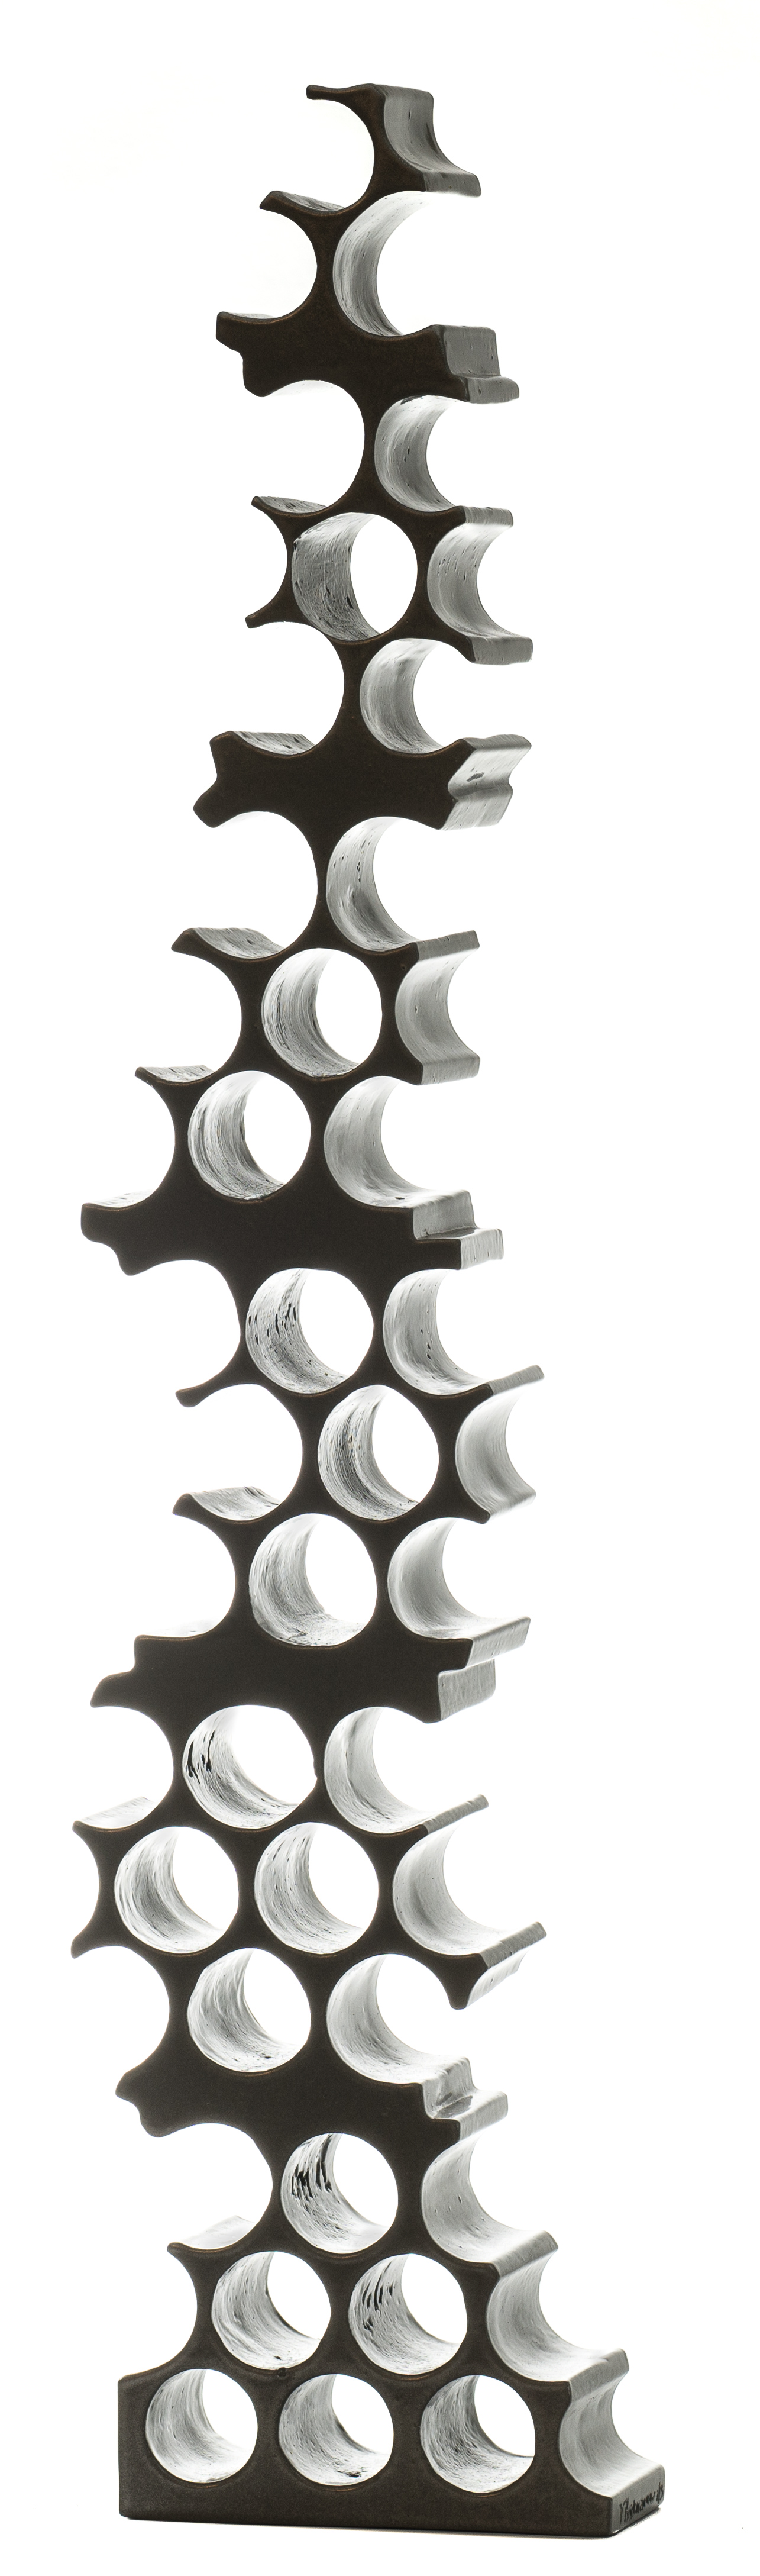 Estructura ascendente/ Ascending Structure (2016) - Viviane Brickmanne